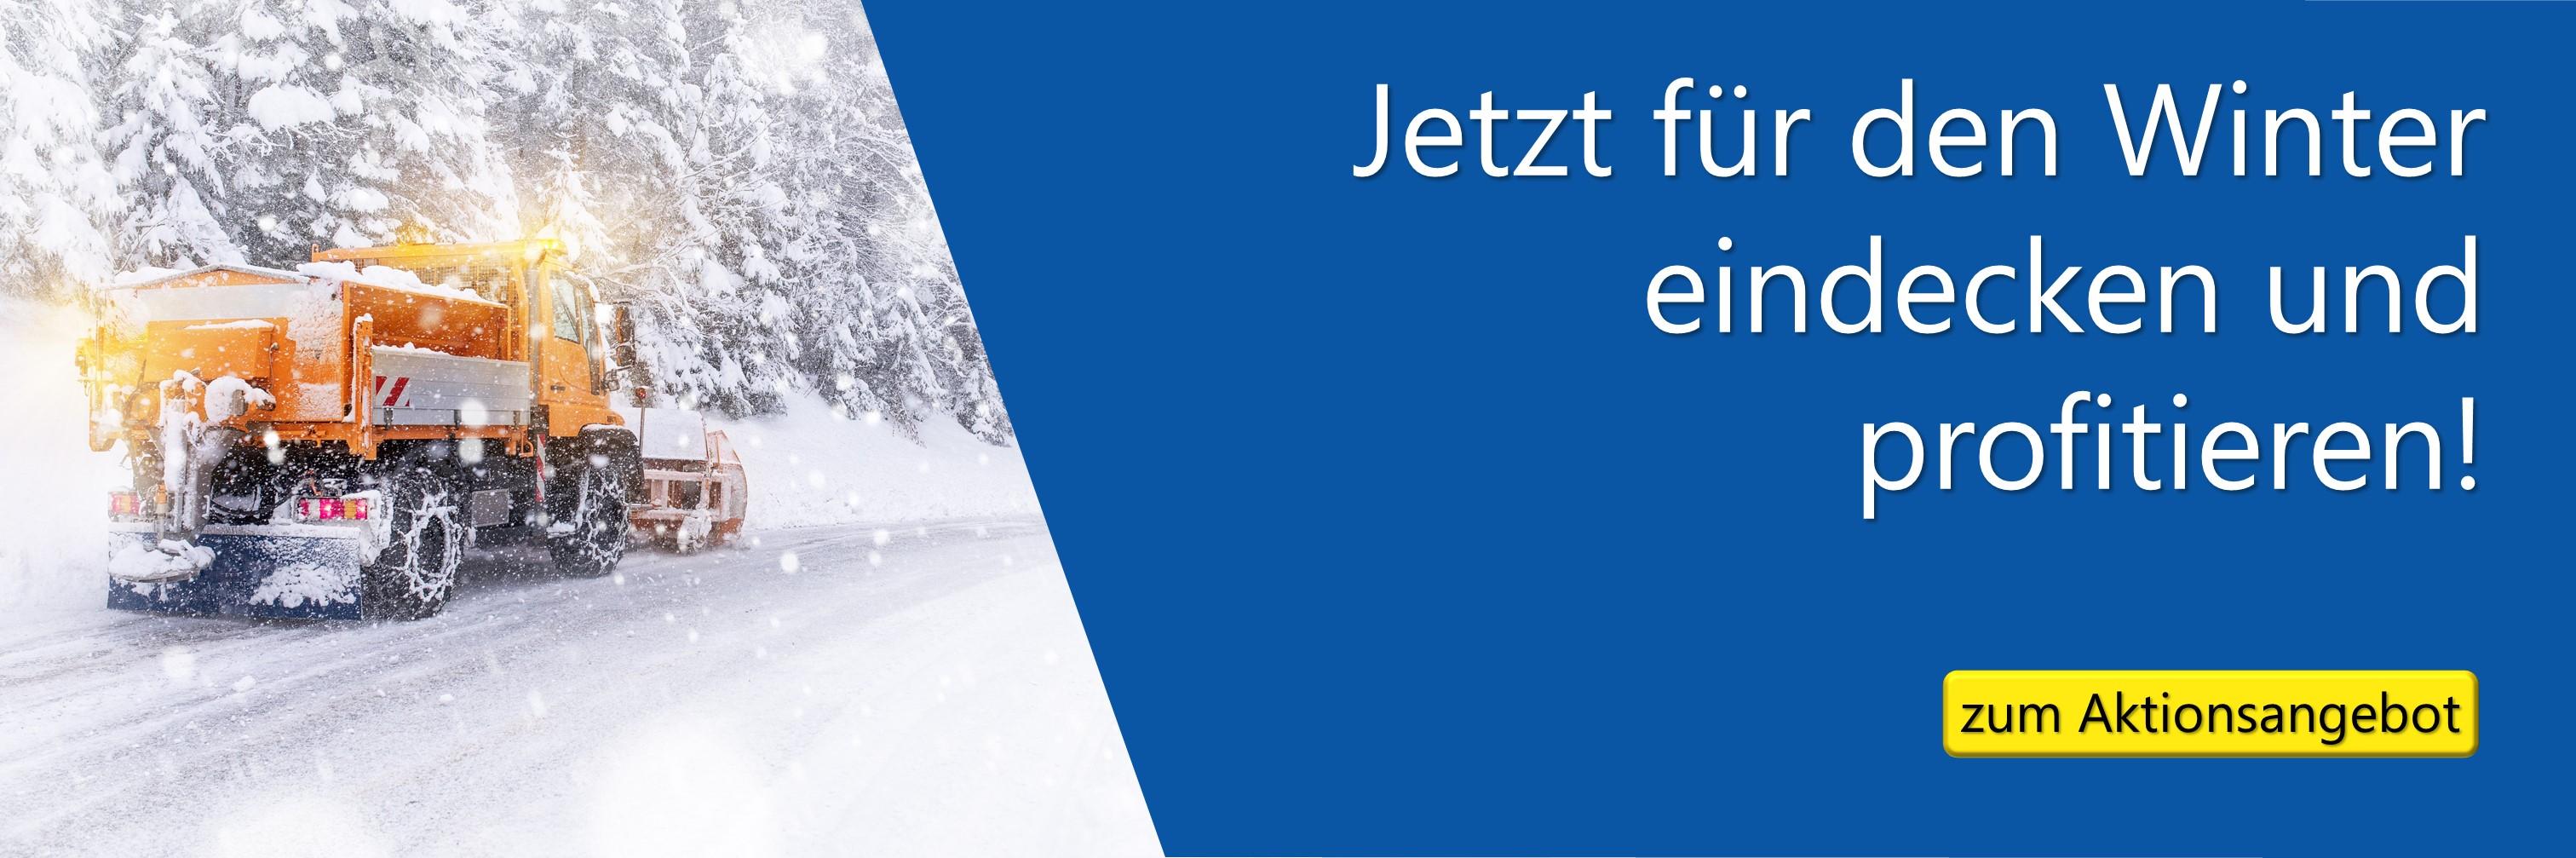 Winteraktion CEMO Streuwagen, Streugutbehälter